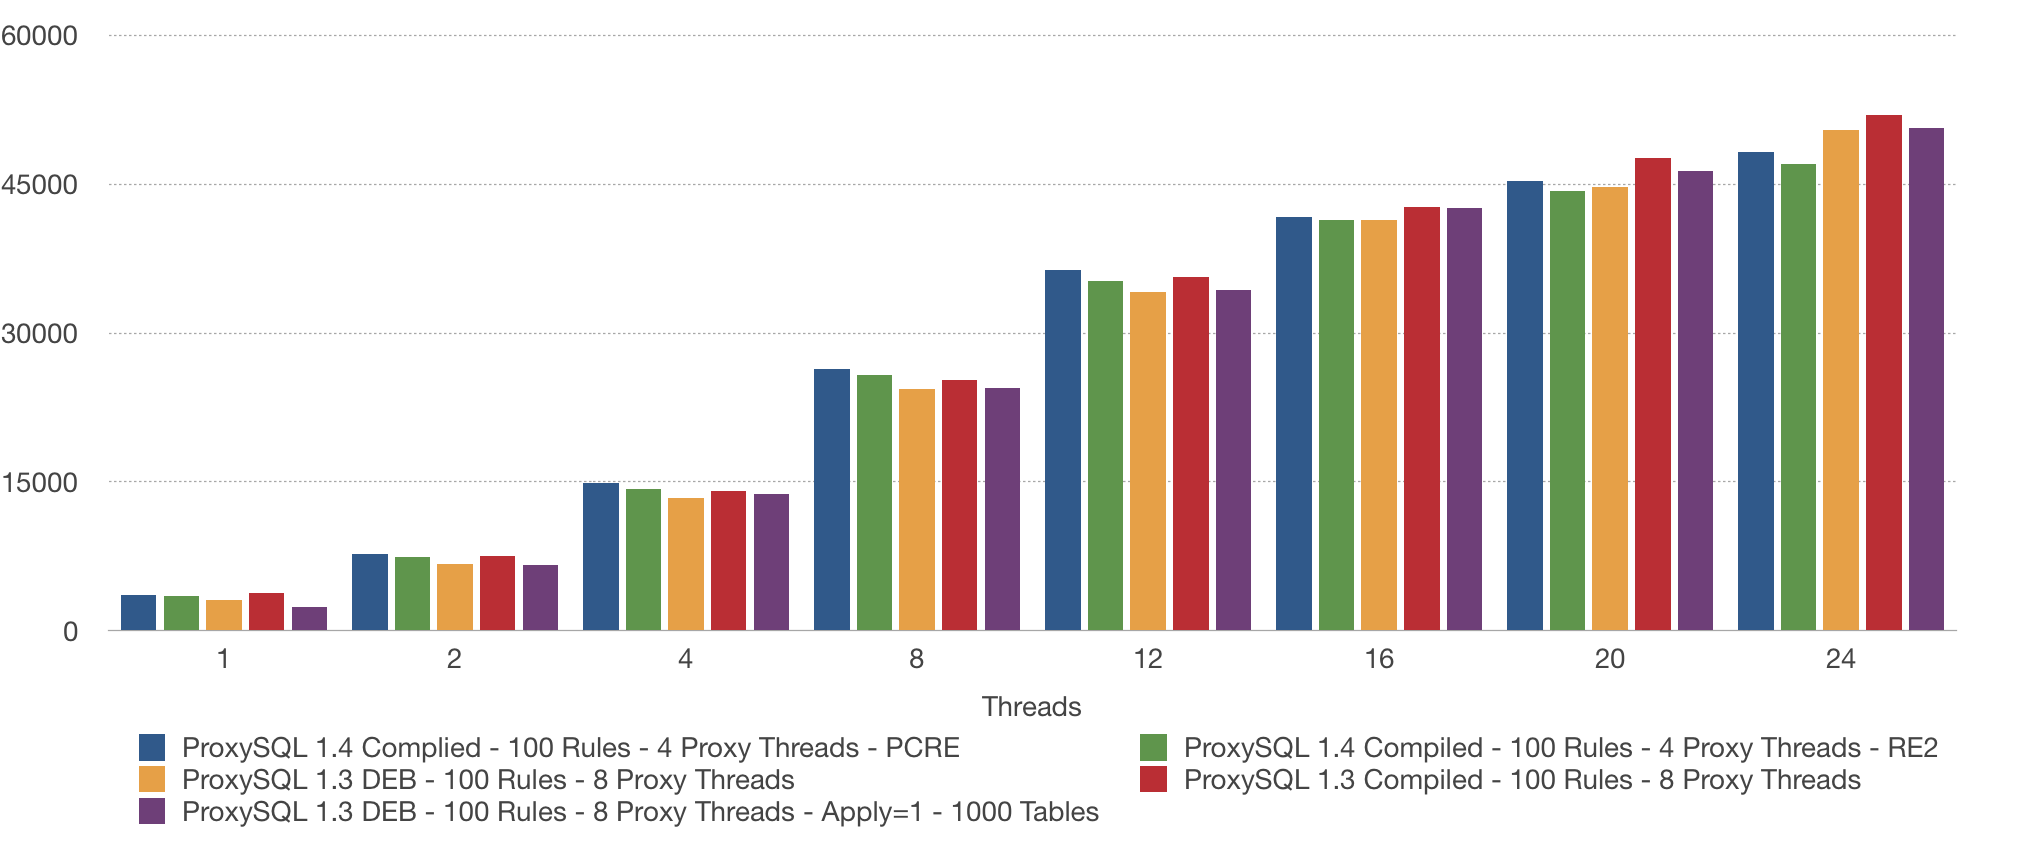 ProxySQL rules